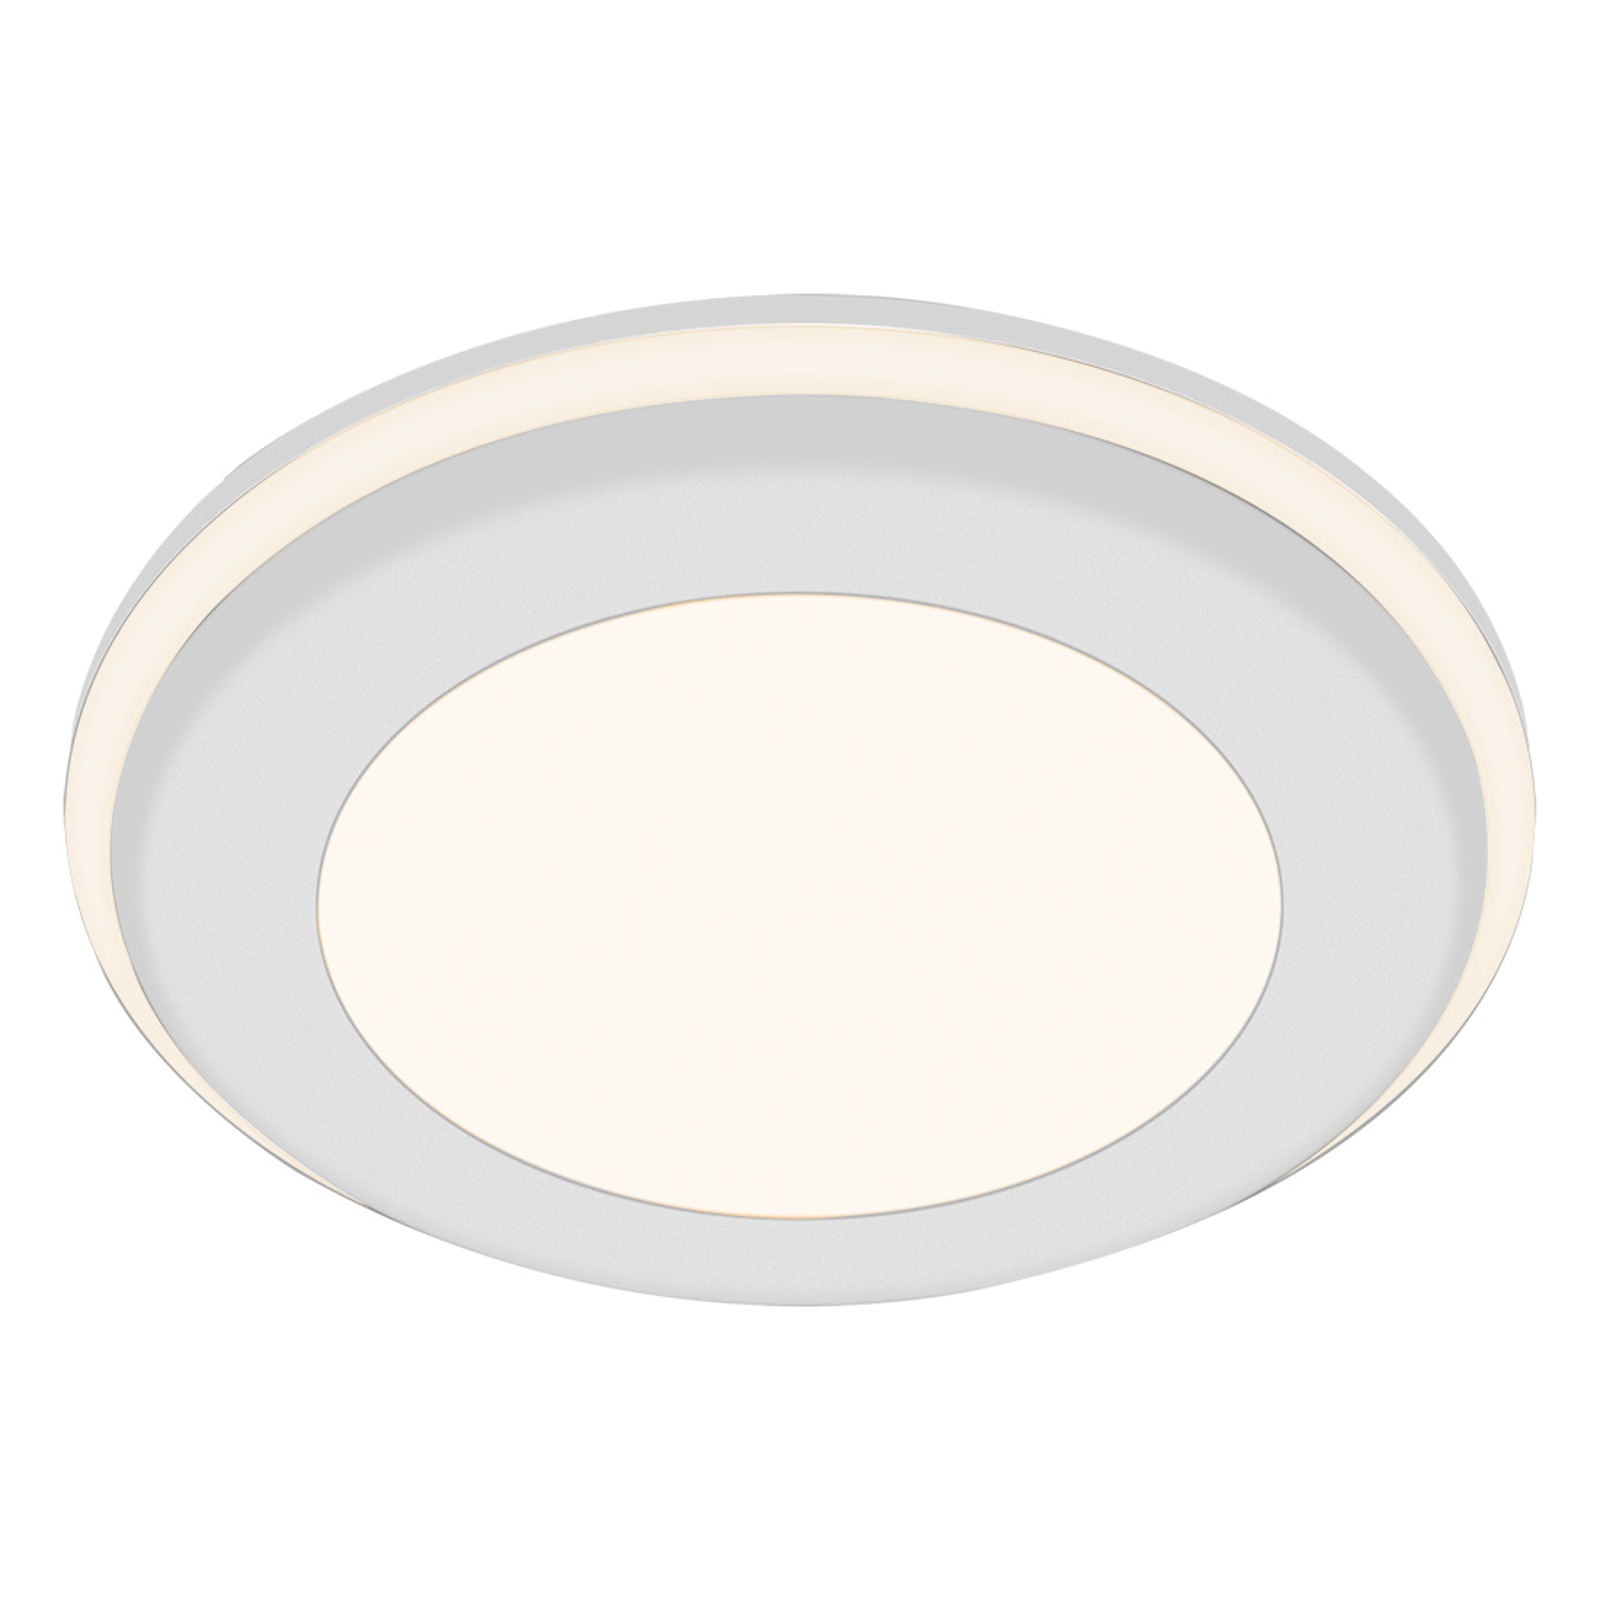 Lampa sufitowa wpuszczana LED Elkton, Ø 14 cm